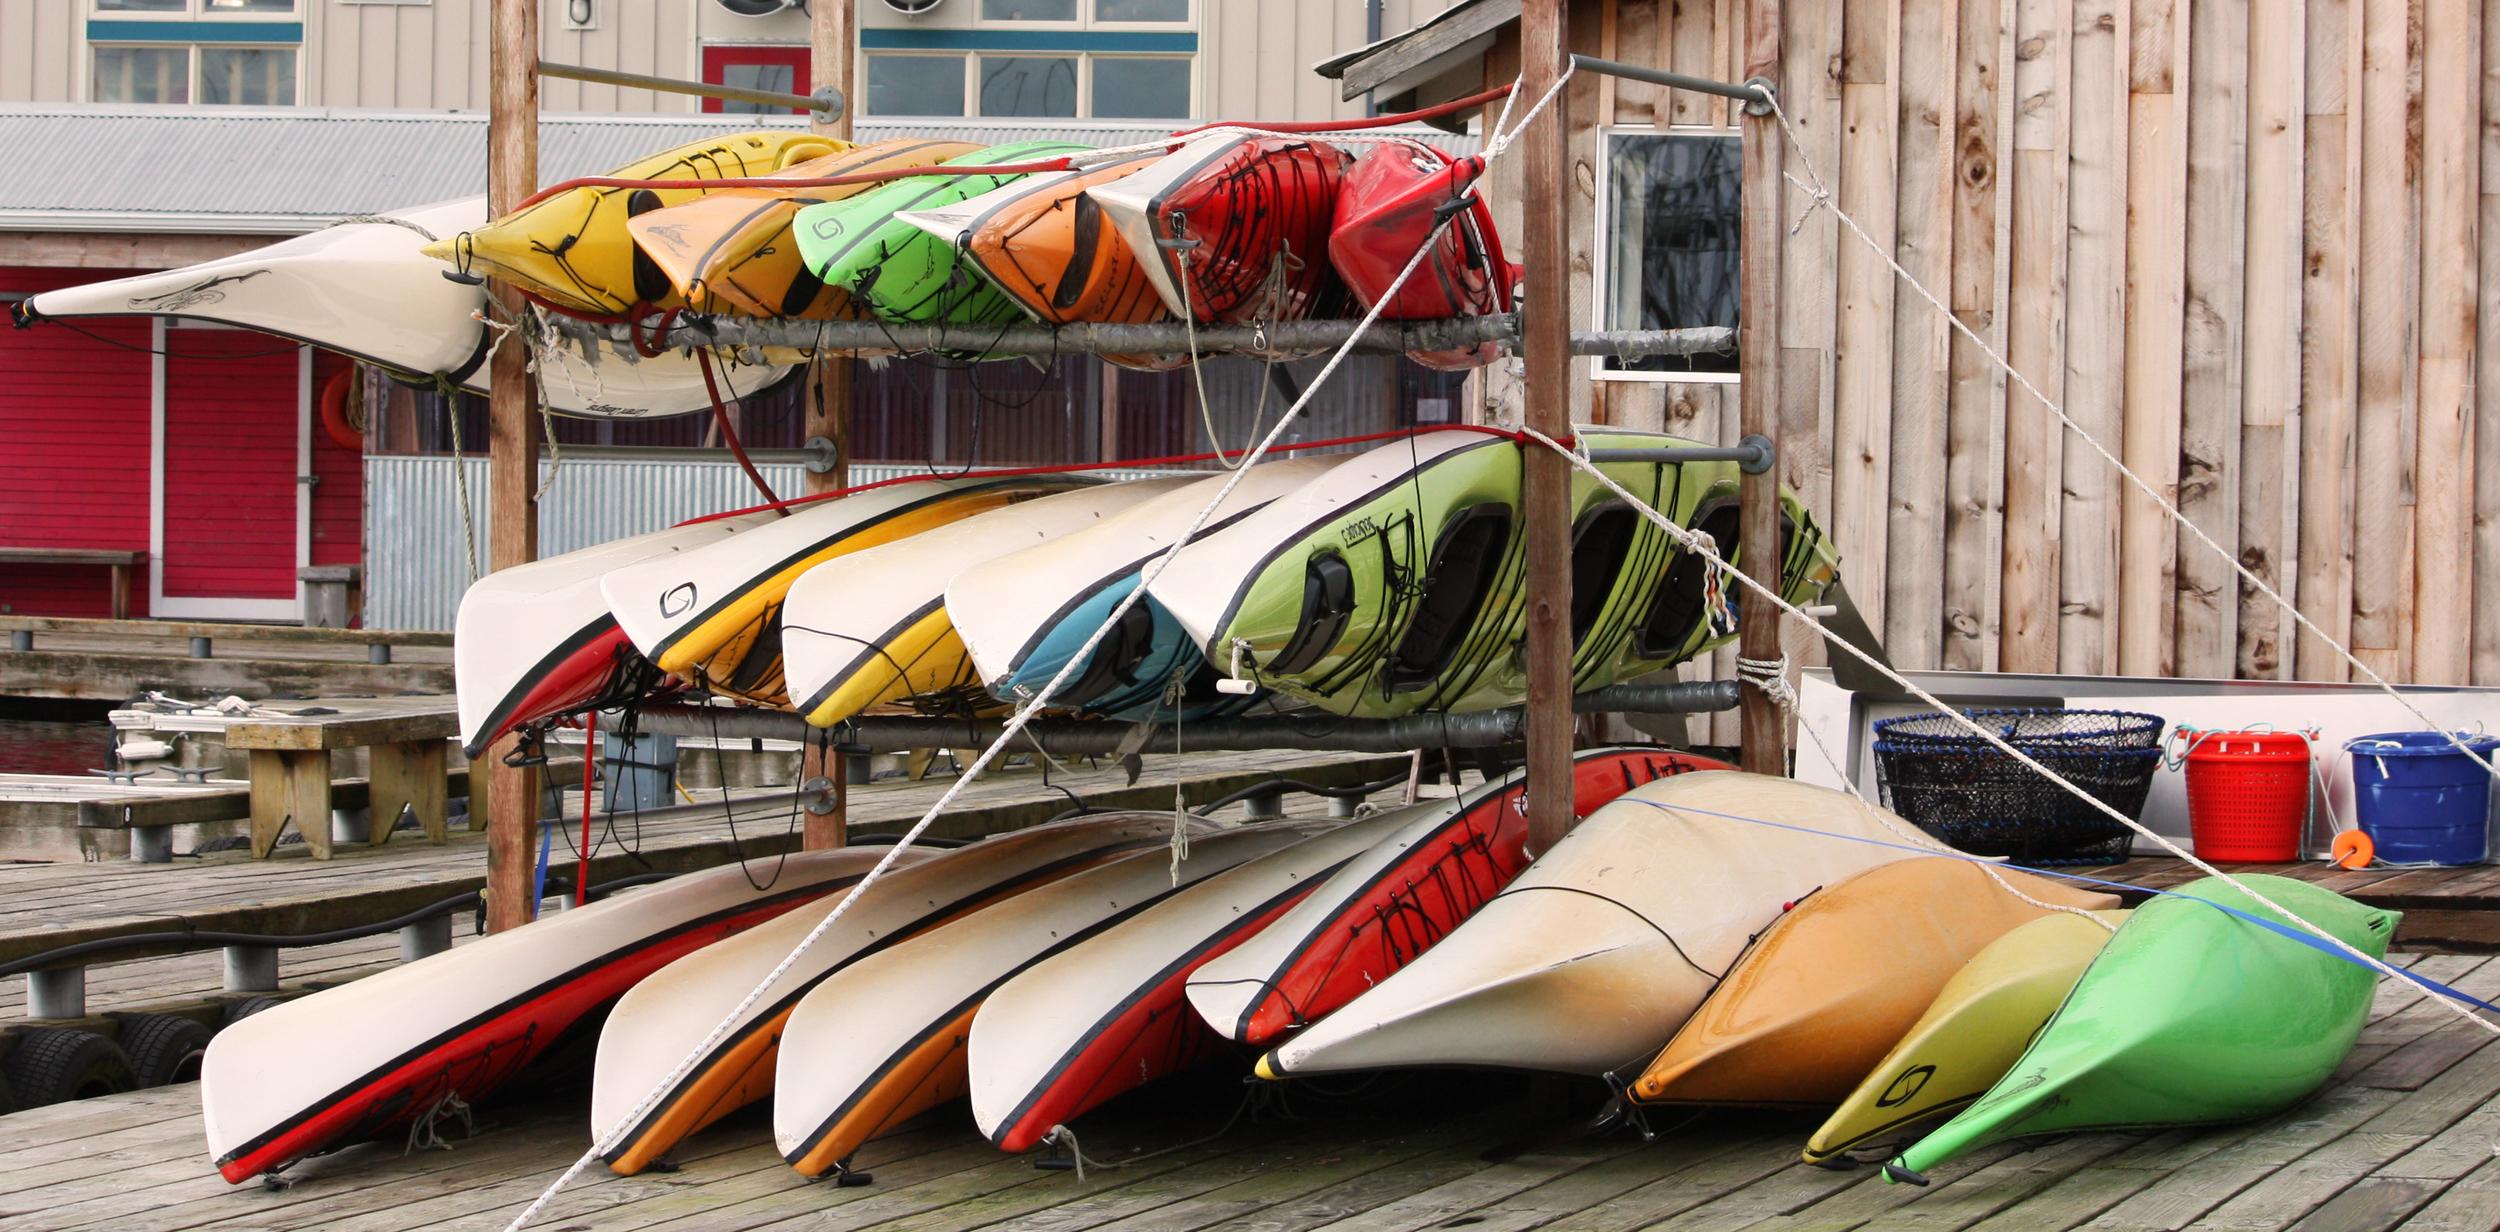 We love kayaks!